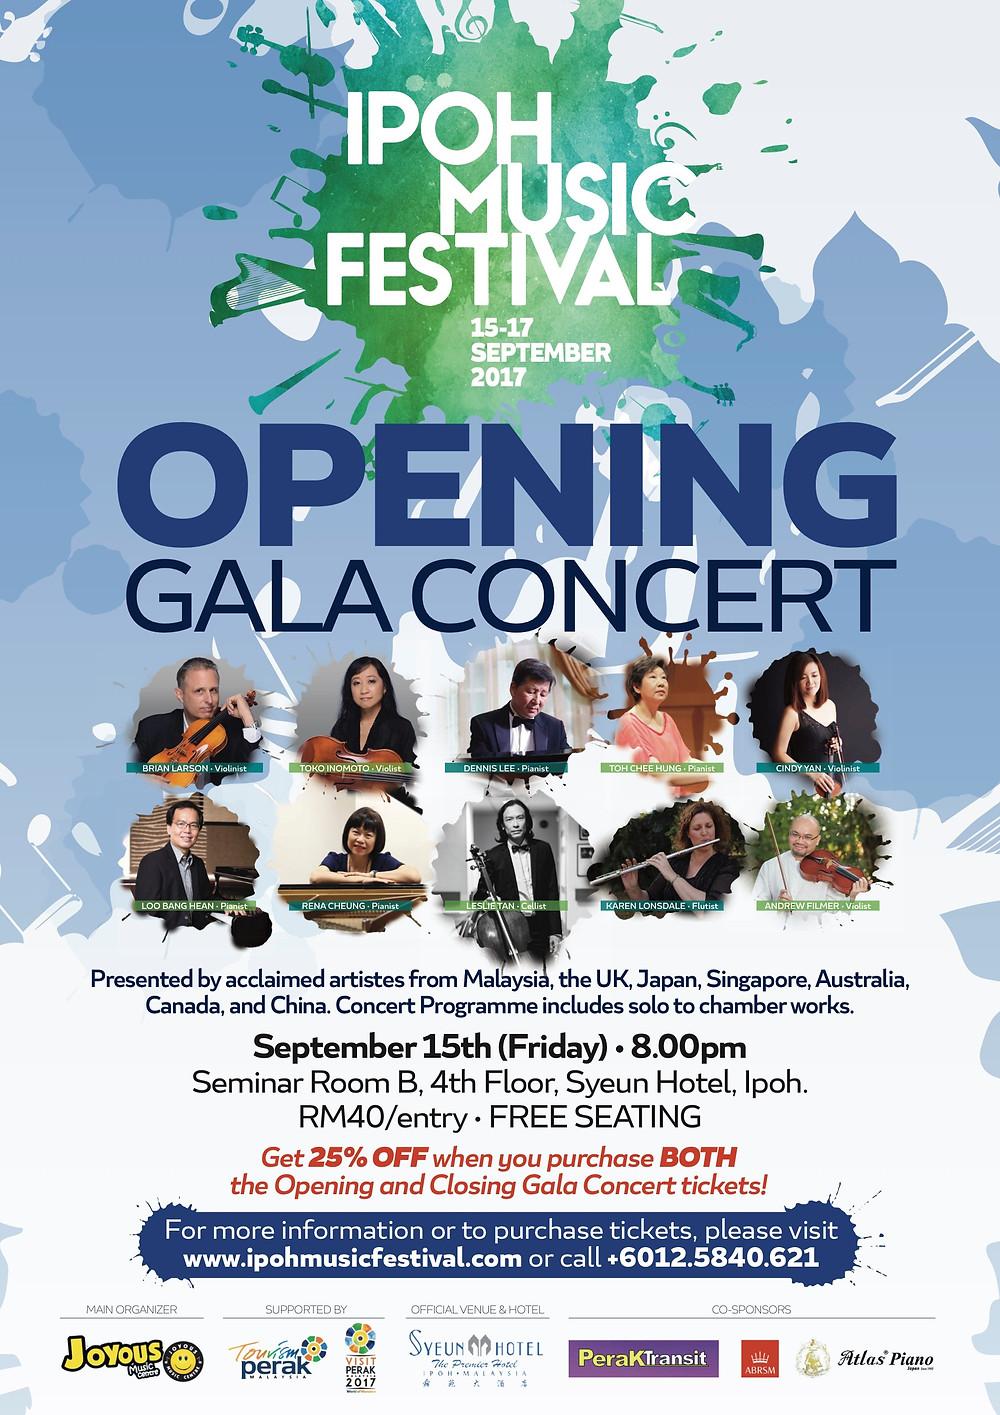 Opening Gala Concert